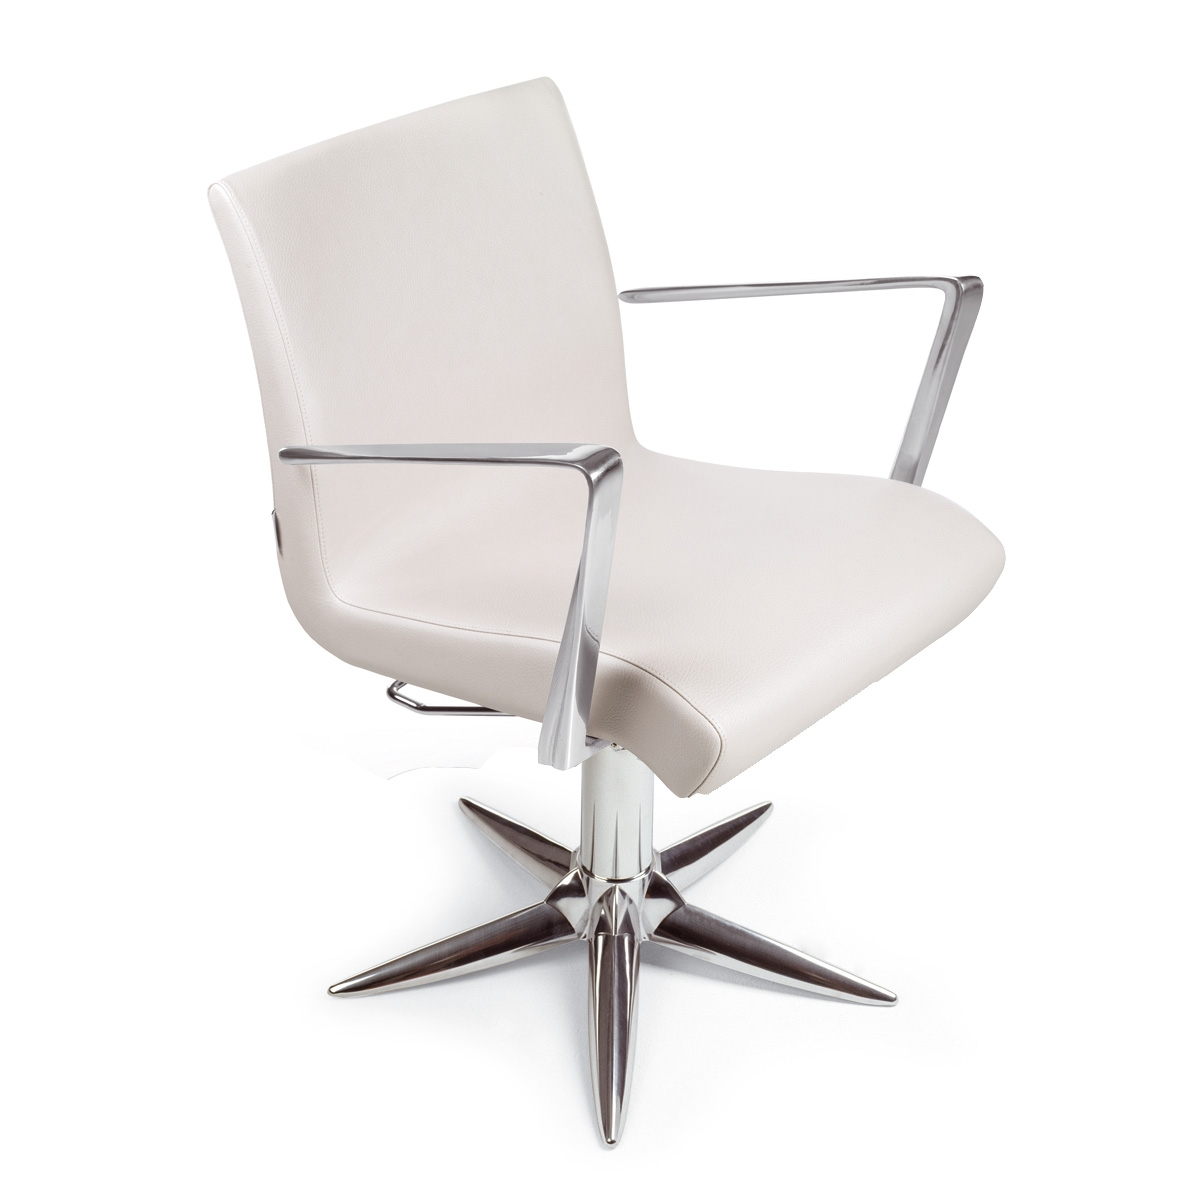 Aluotis Parrot Styling Salon Chairs Gamma Amp Bross